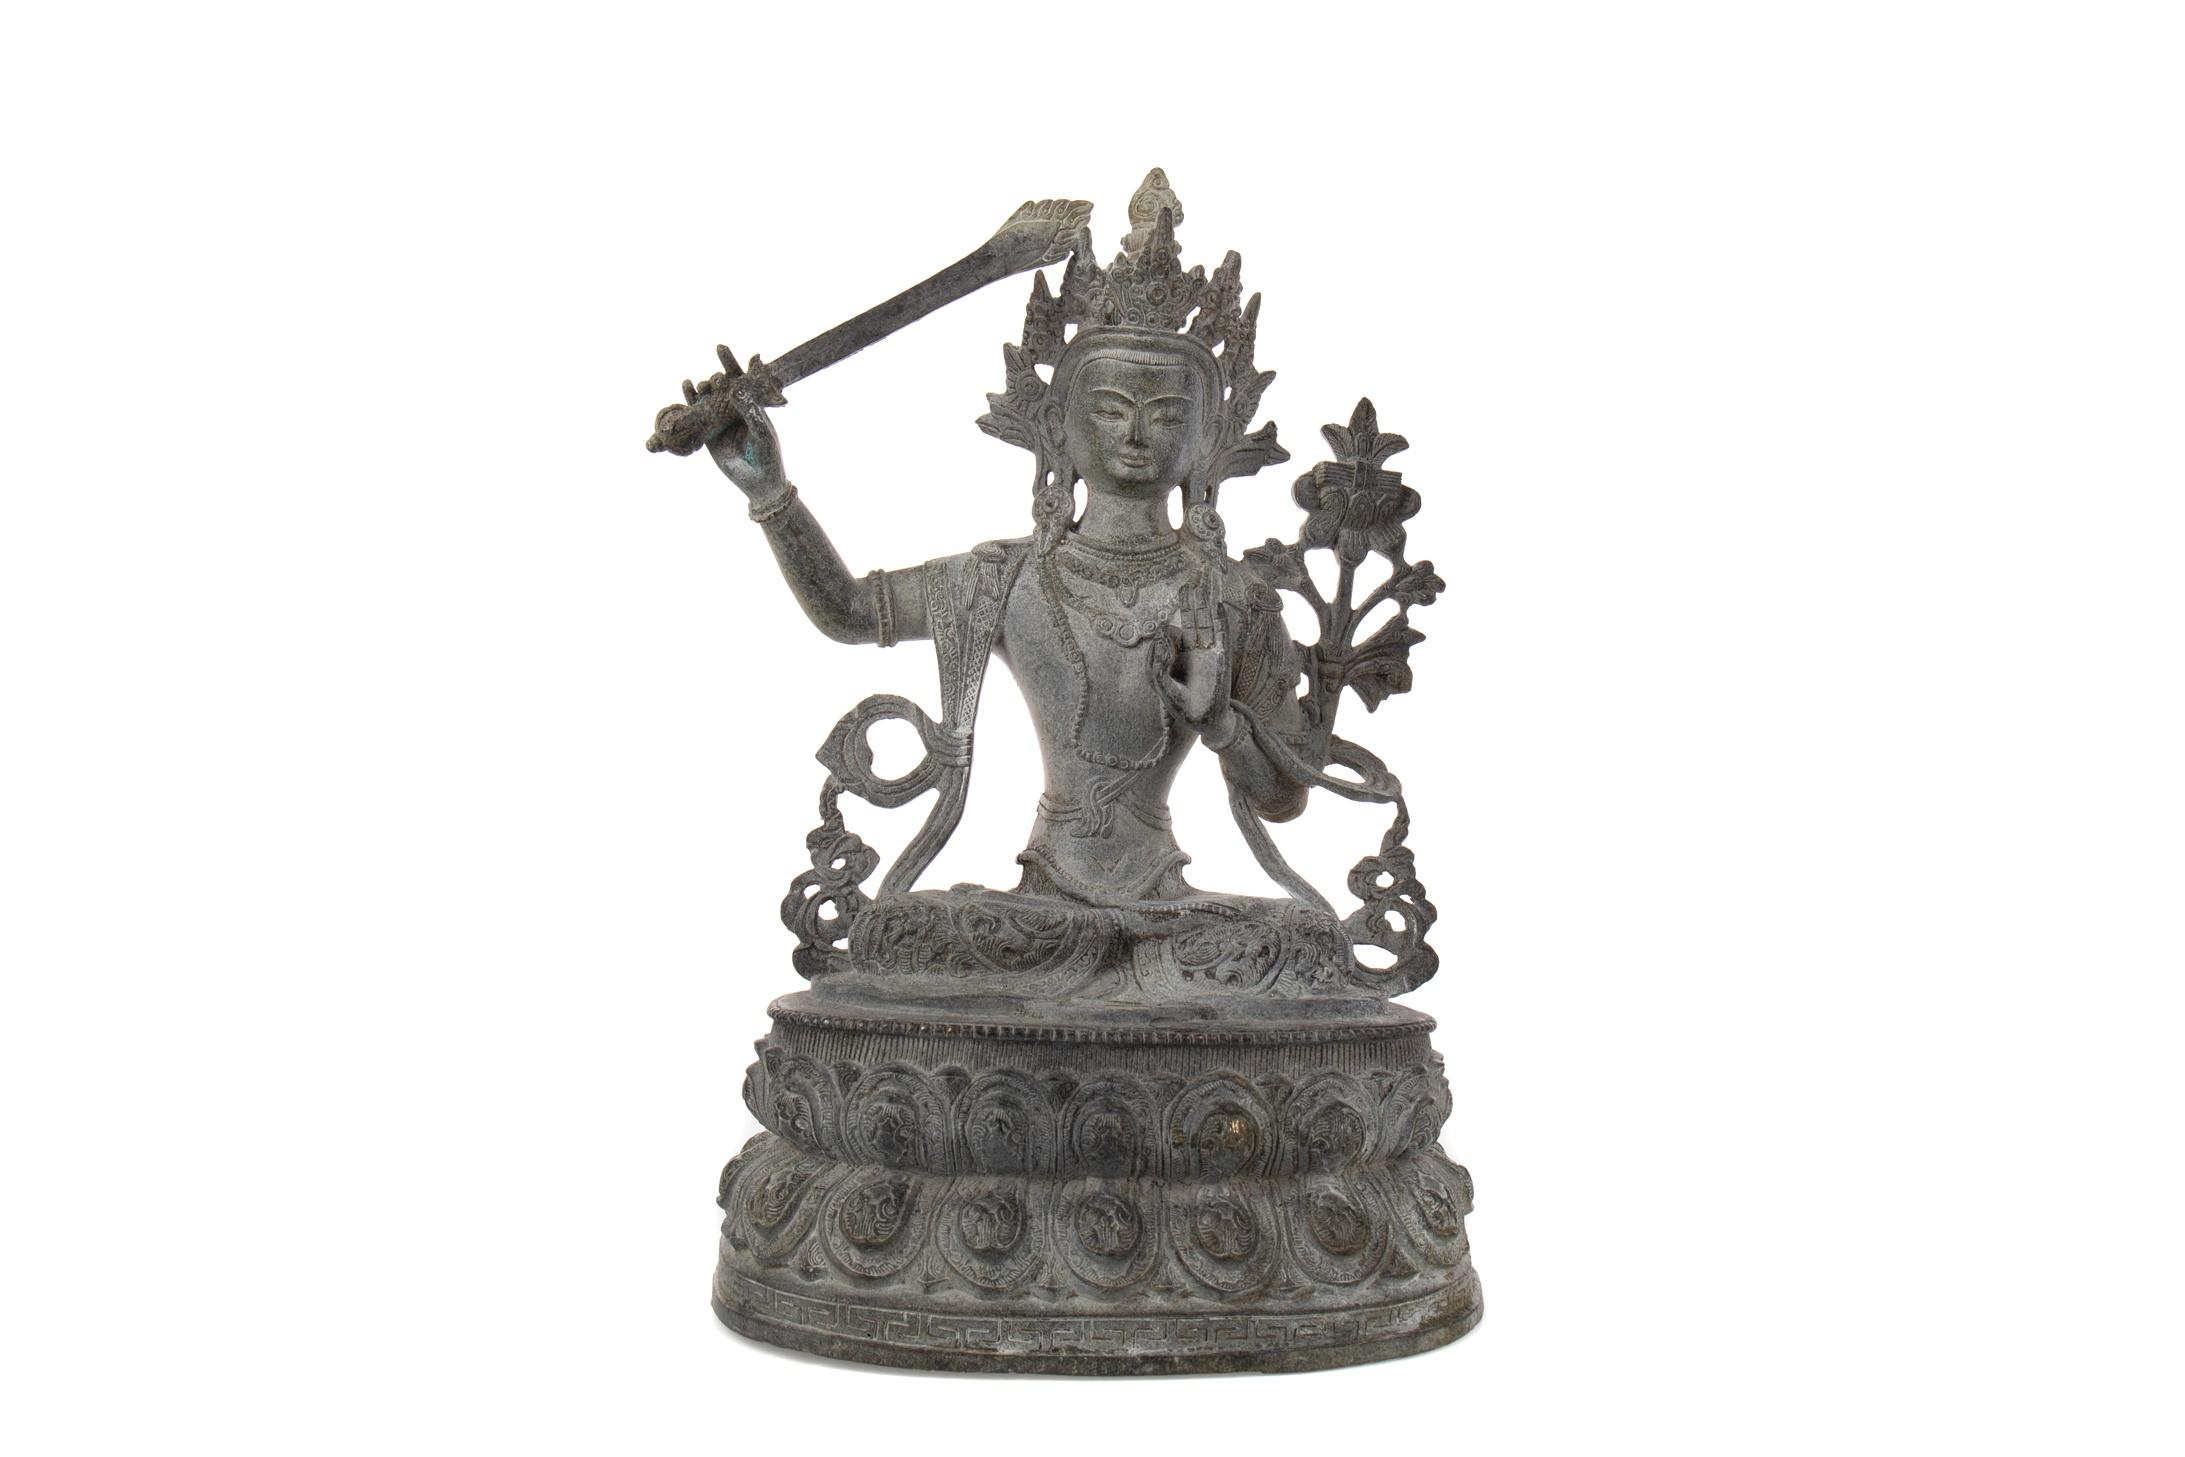 A CHINESE/THAI BRONZED METAL DEITY